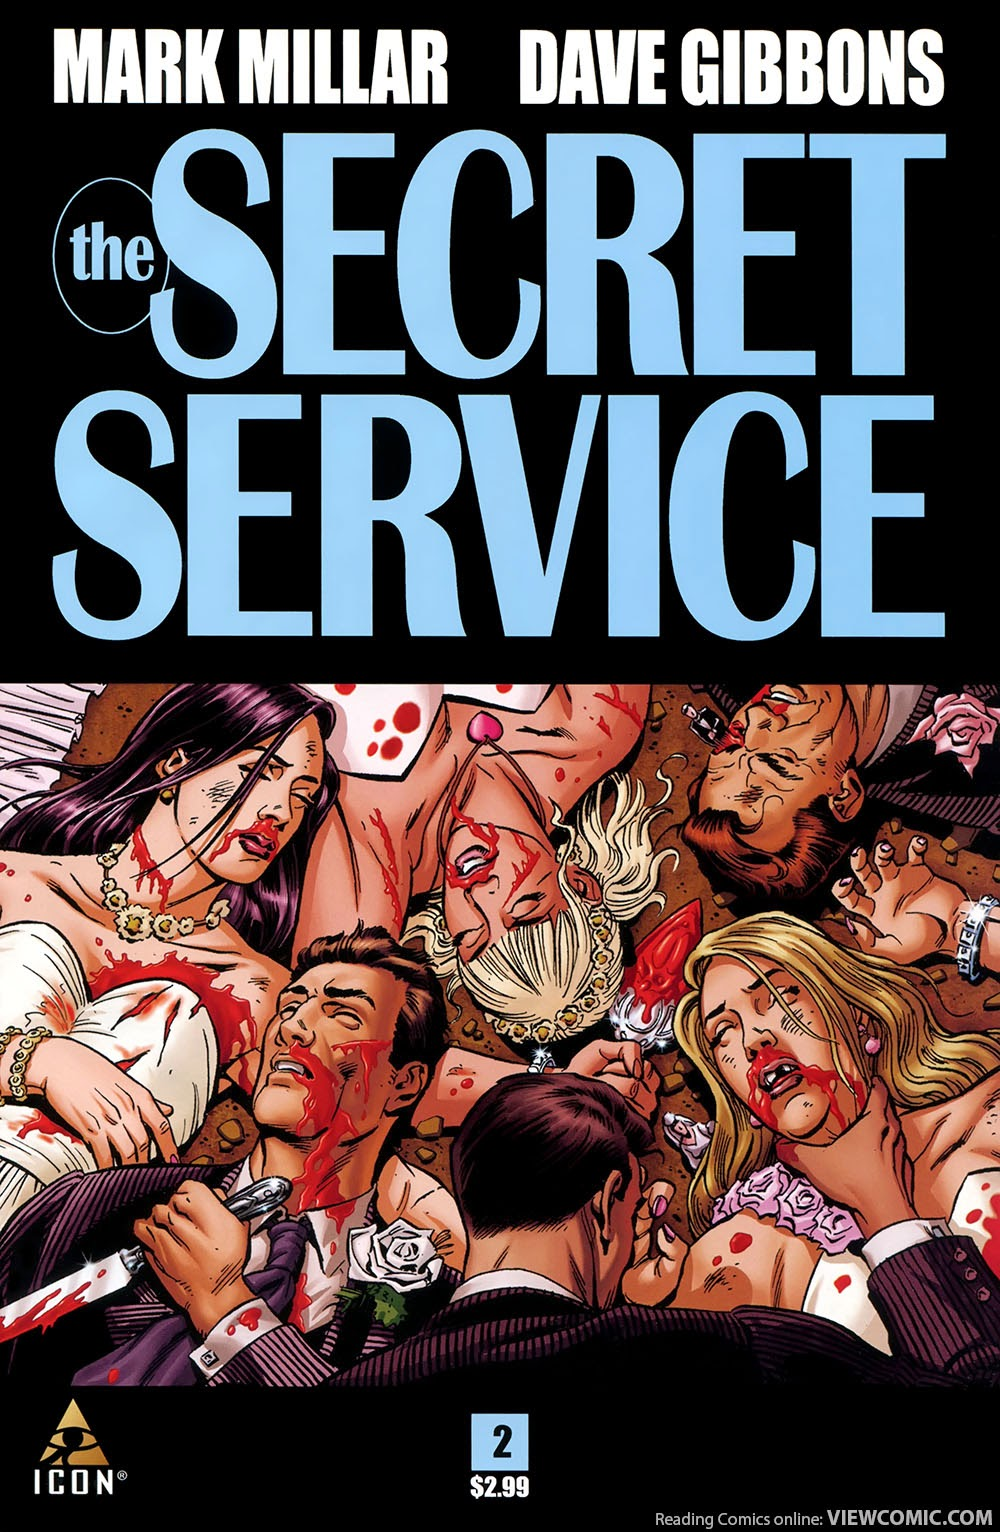 secret service viewcomic reading comics online for free 2018